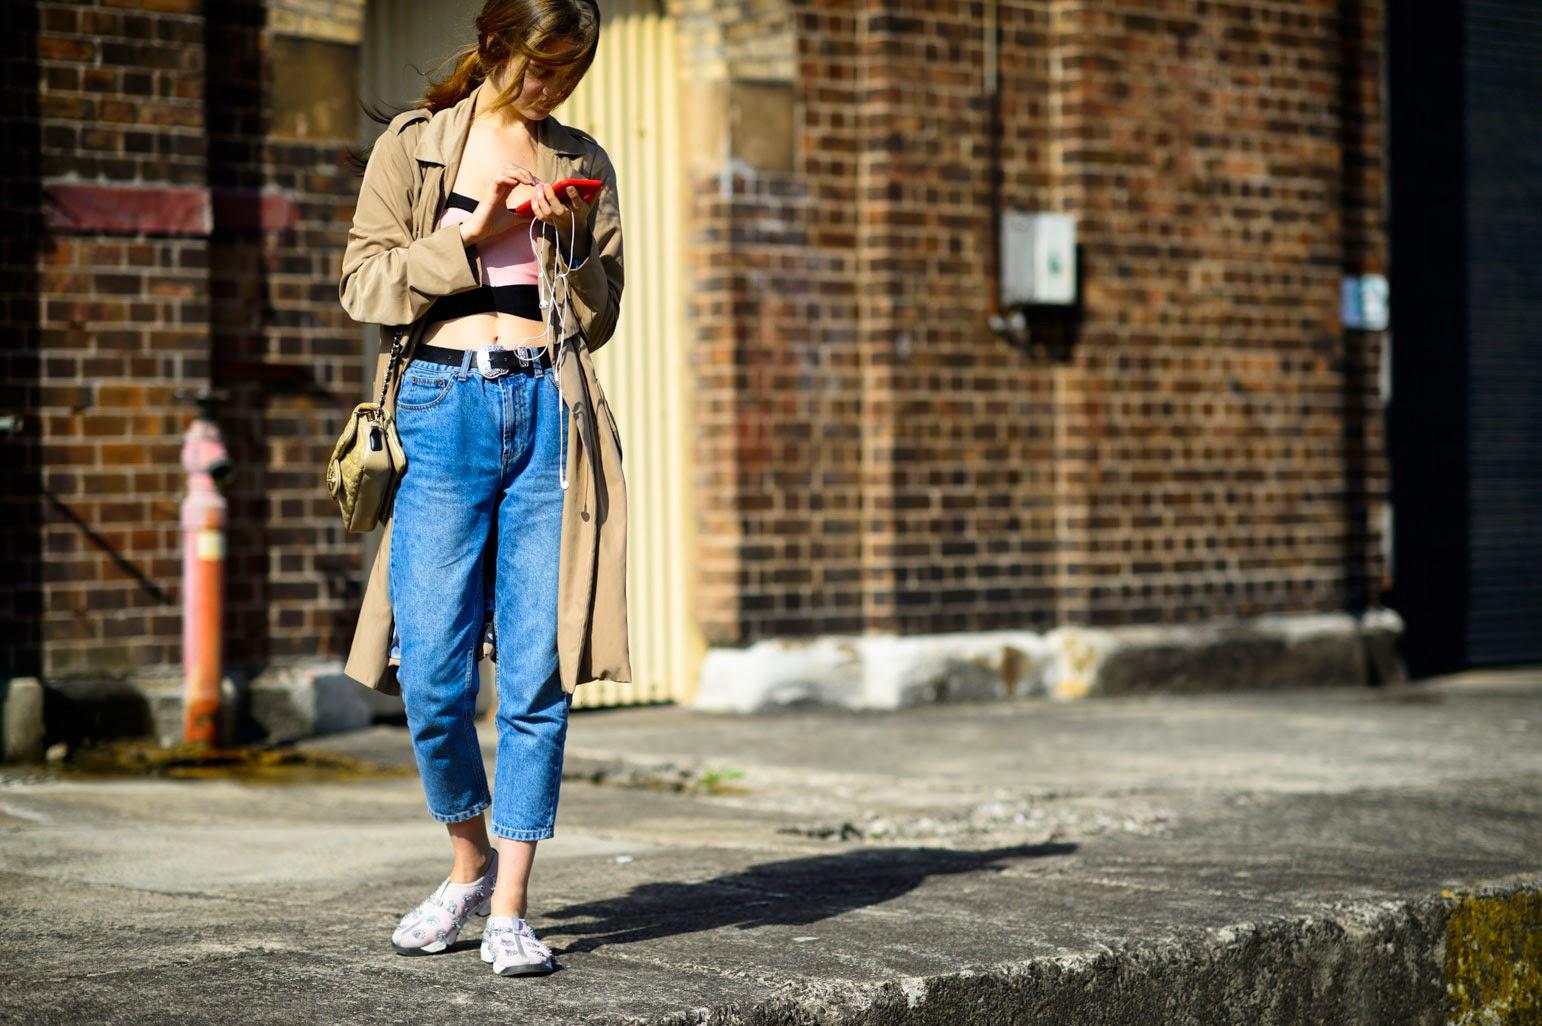 StreetStyle-Sidney-Elblogdepatricia-shoes-calzado-zapatos-scarpe-calzature